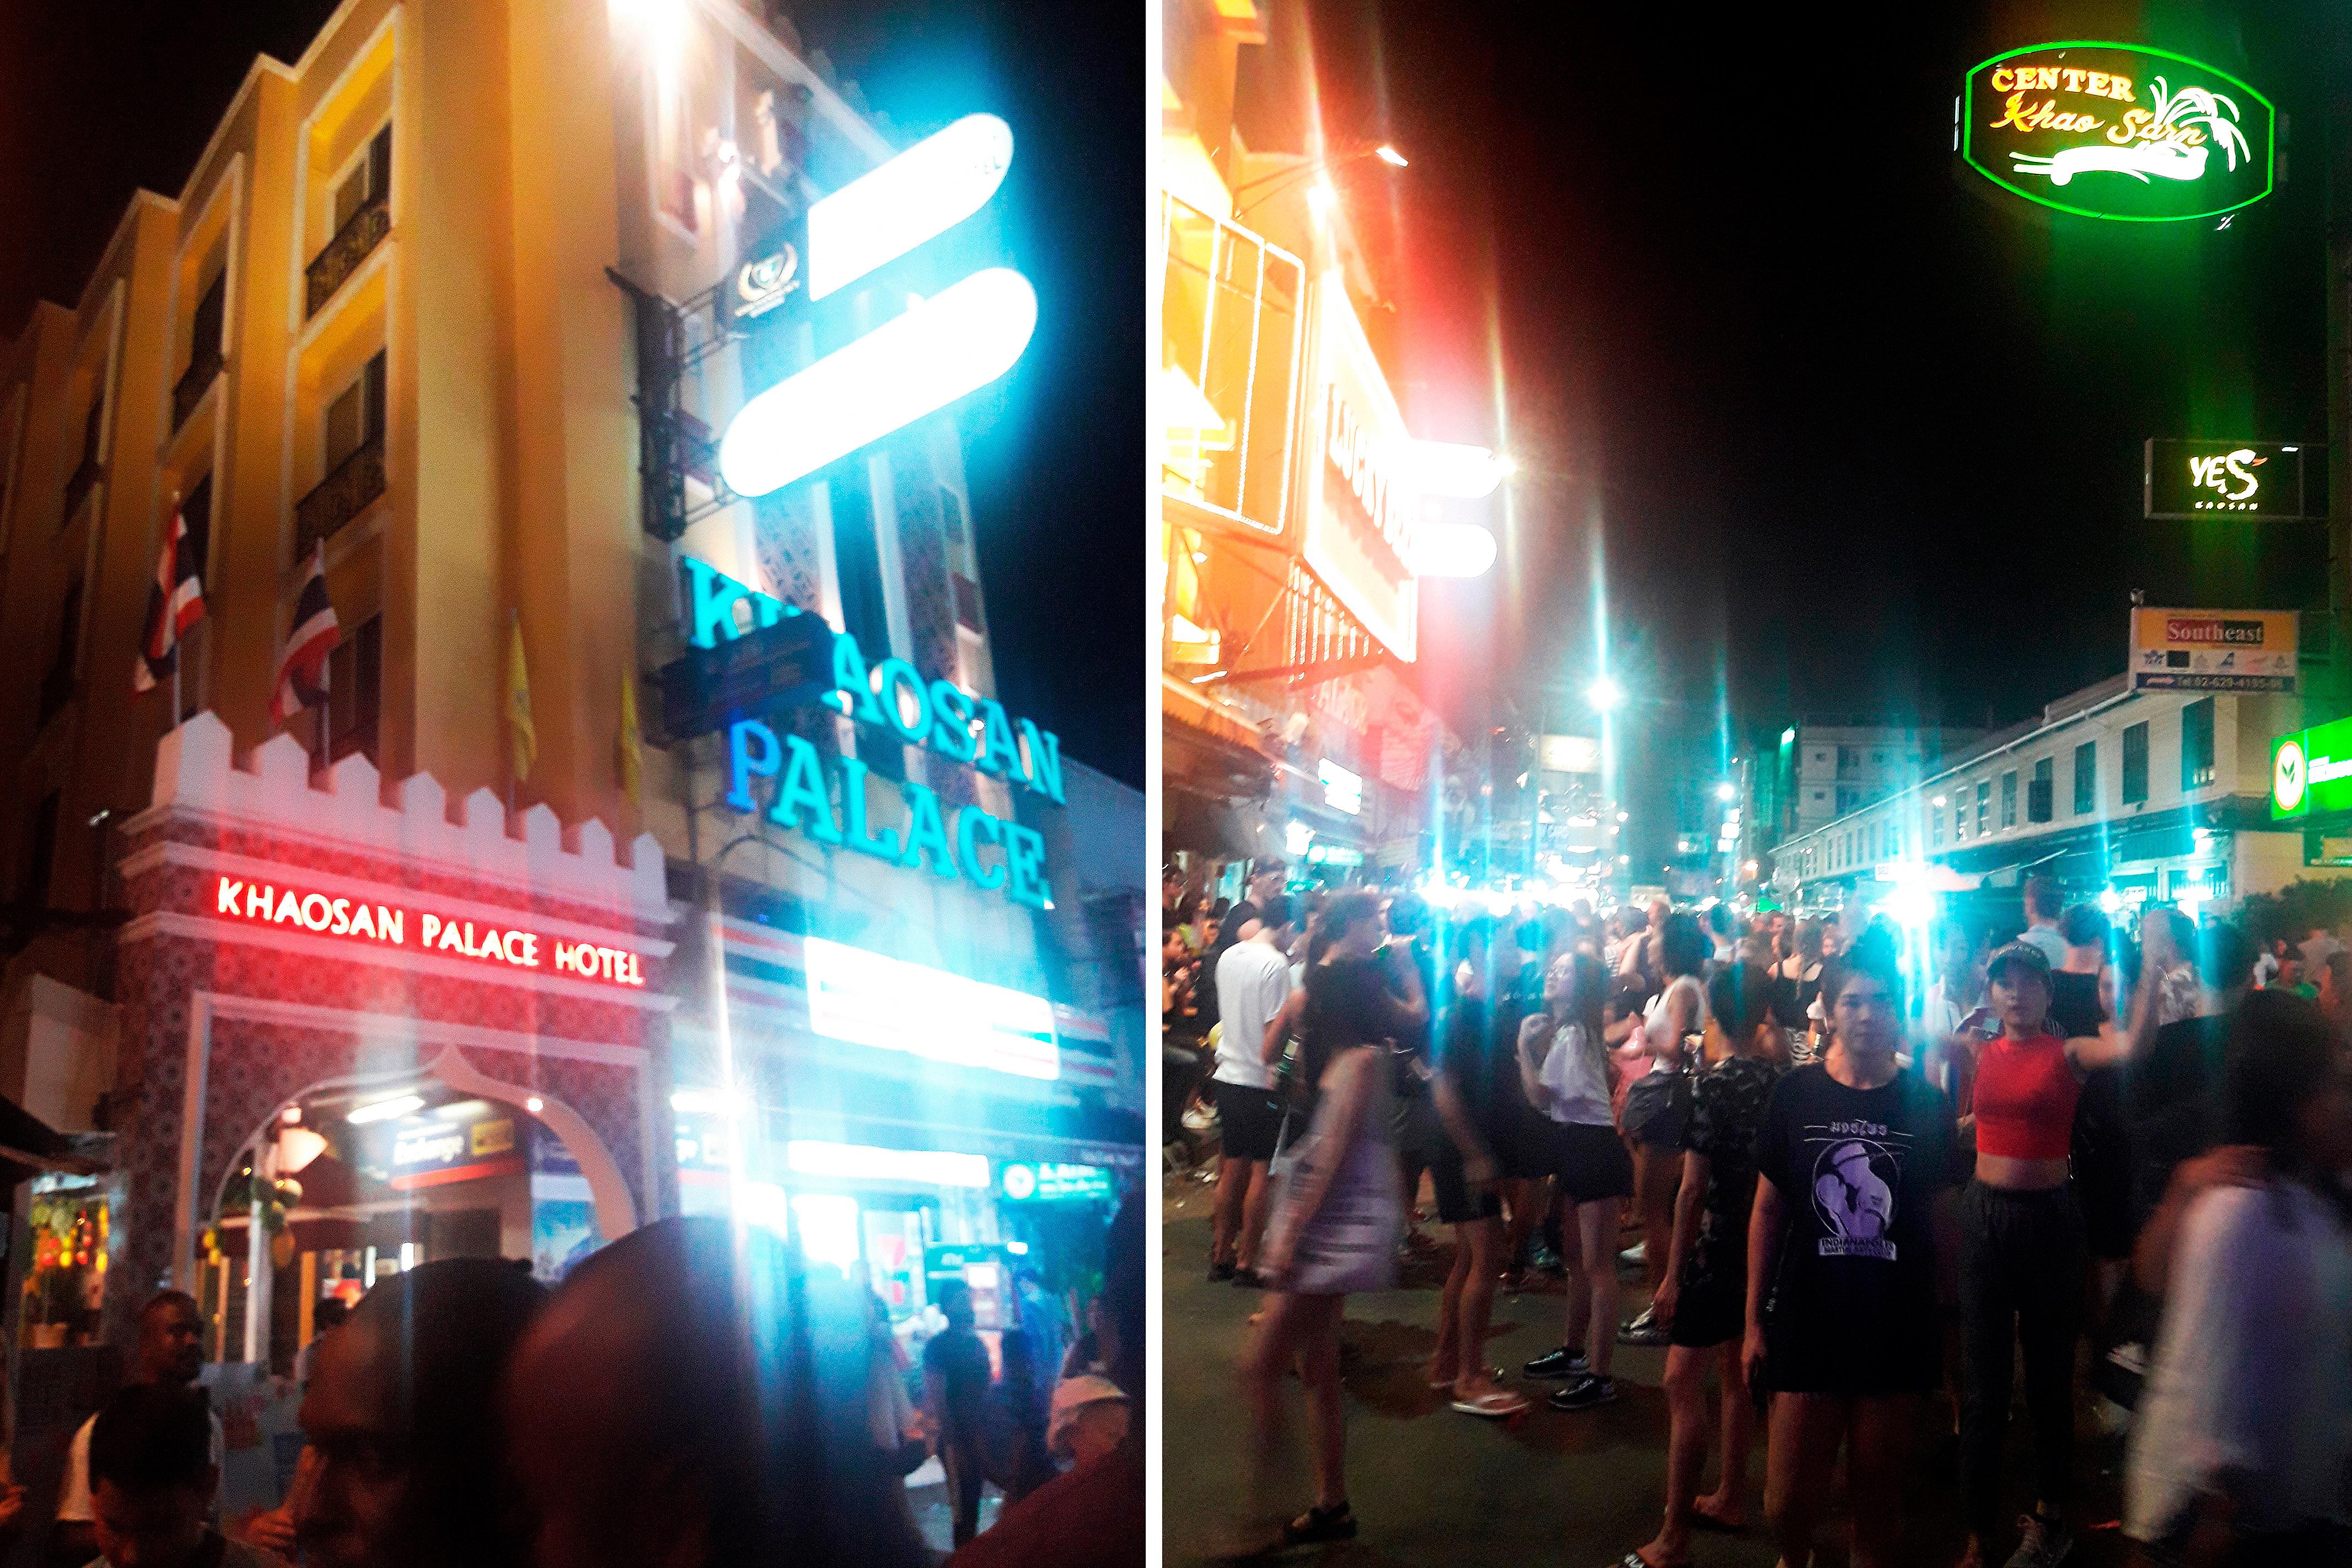 Улица Као Сан, Банкок / Khao San Street, Bangkok